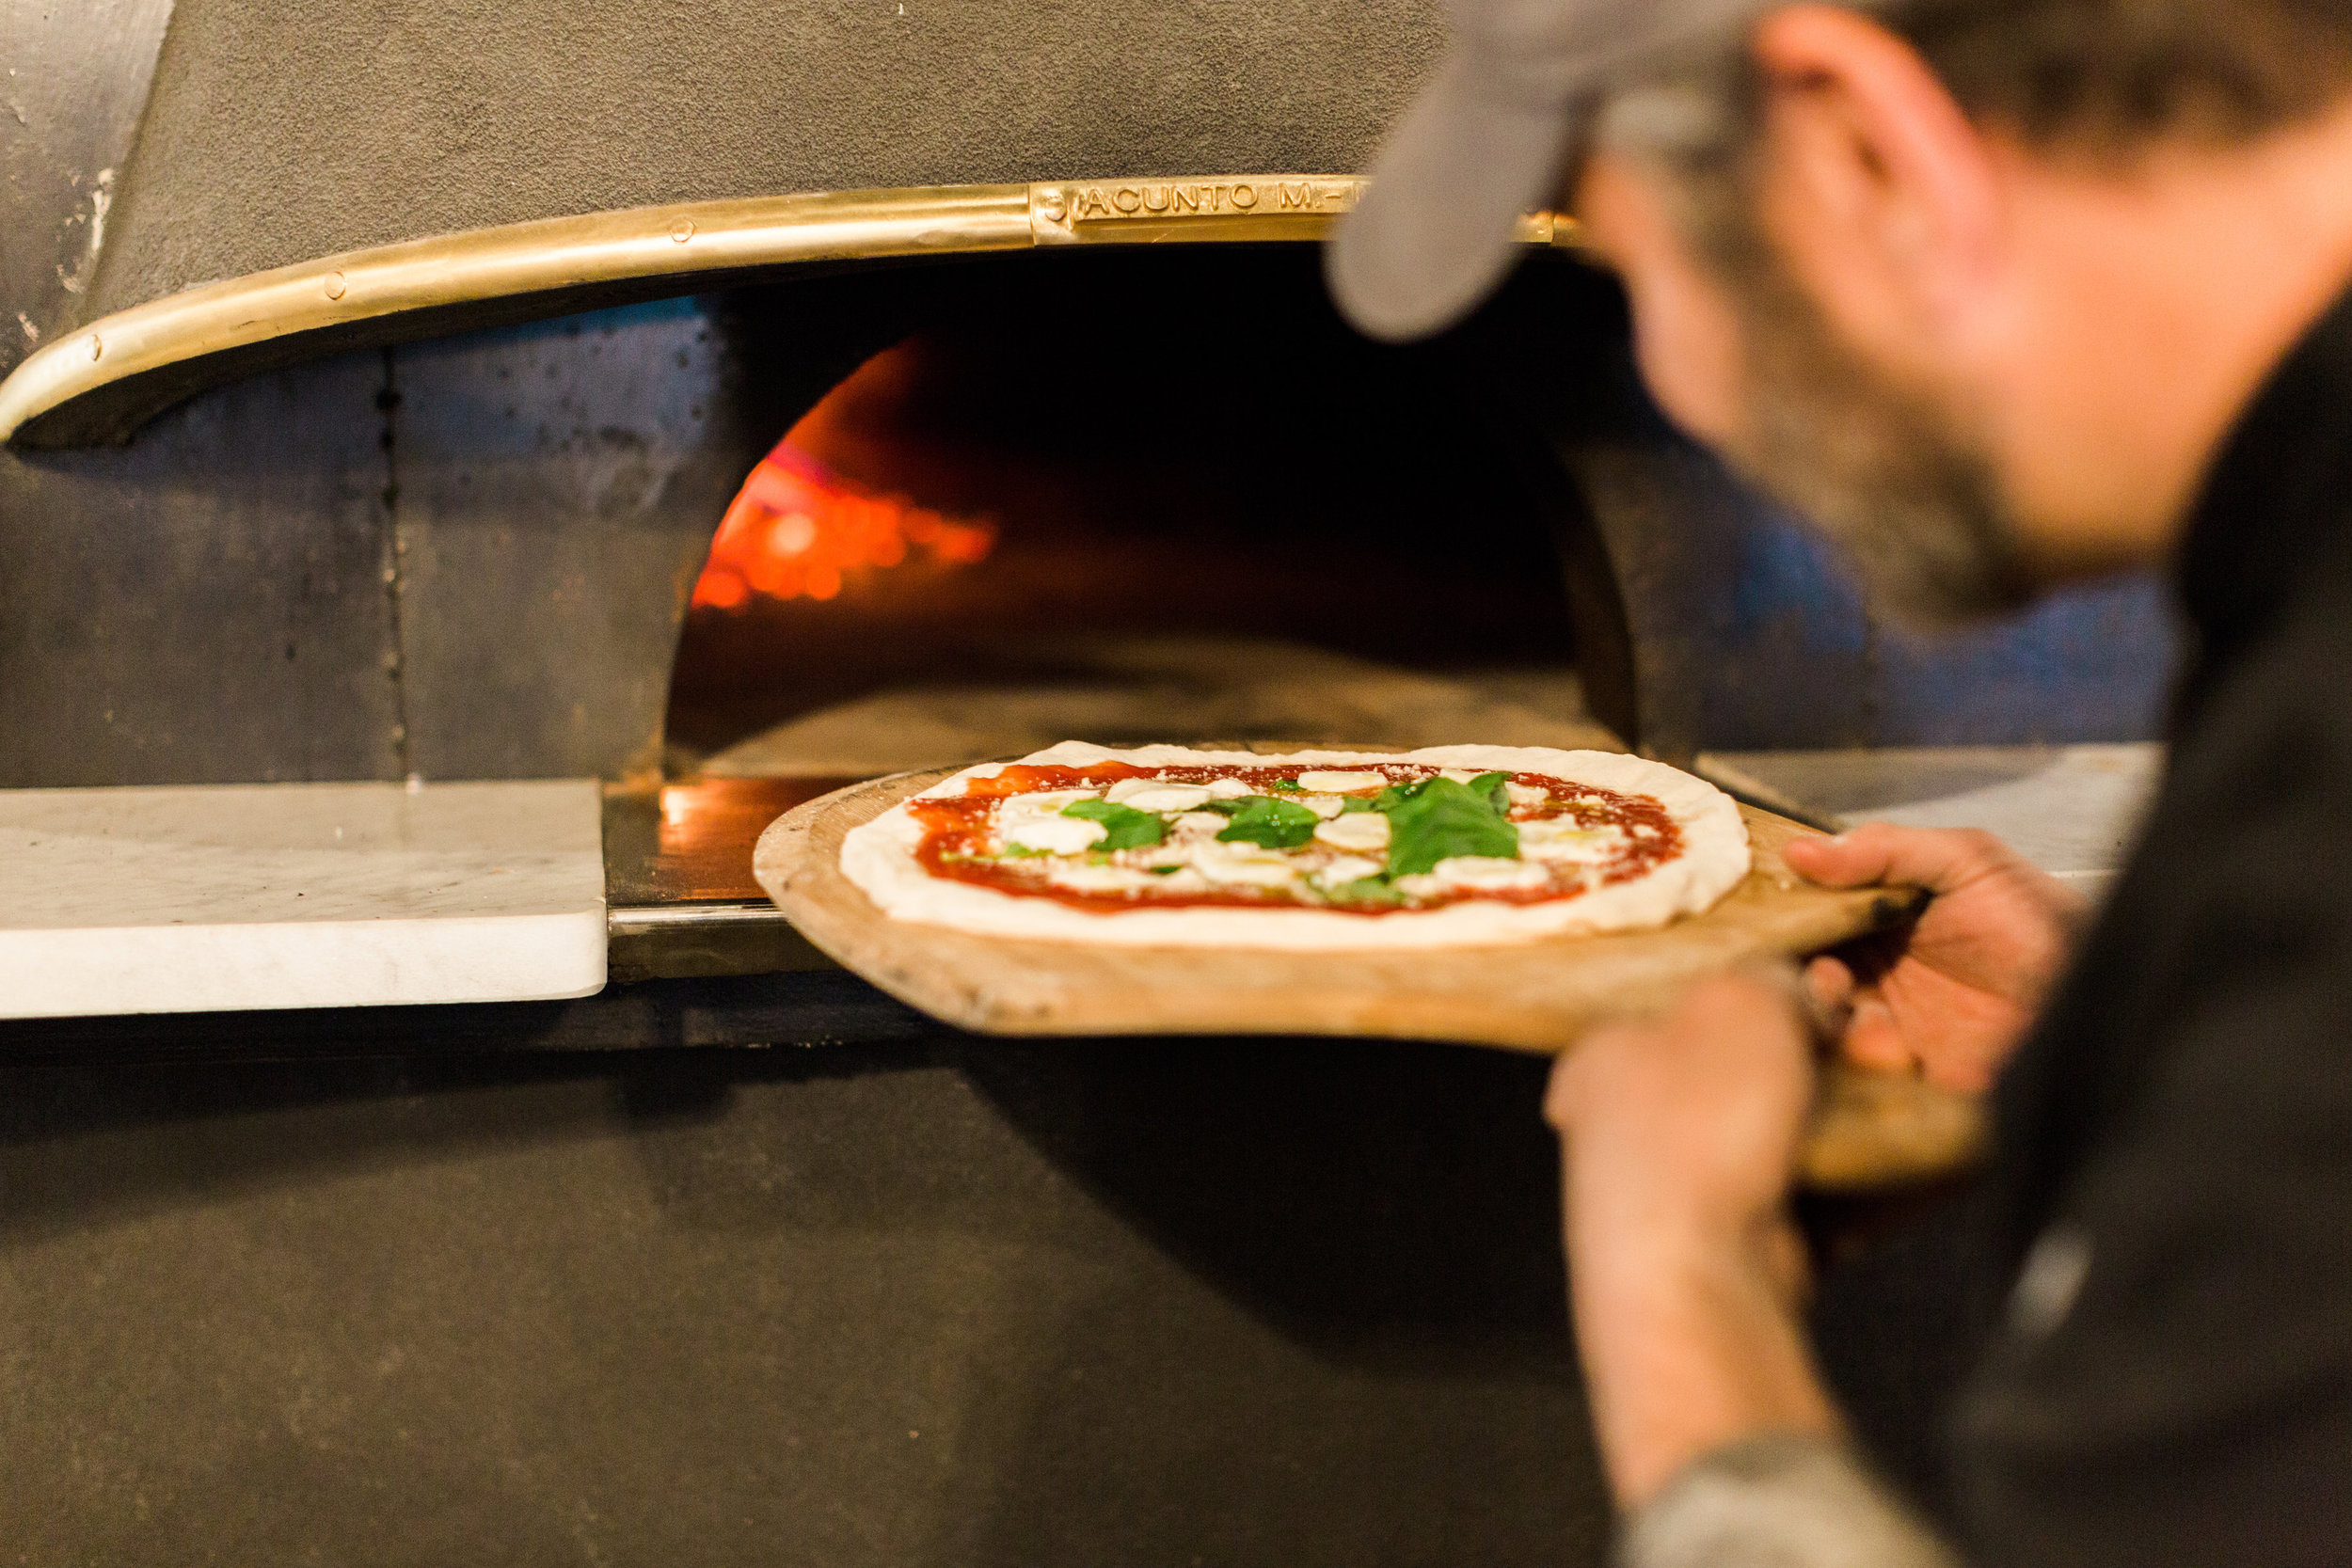 pizzashoppe43.jpg